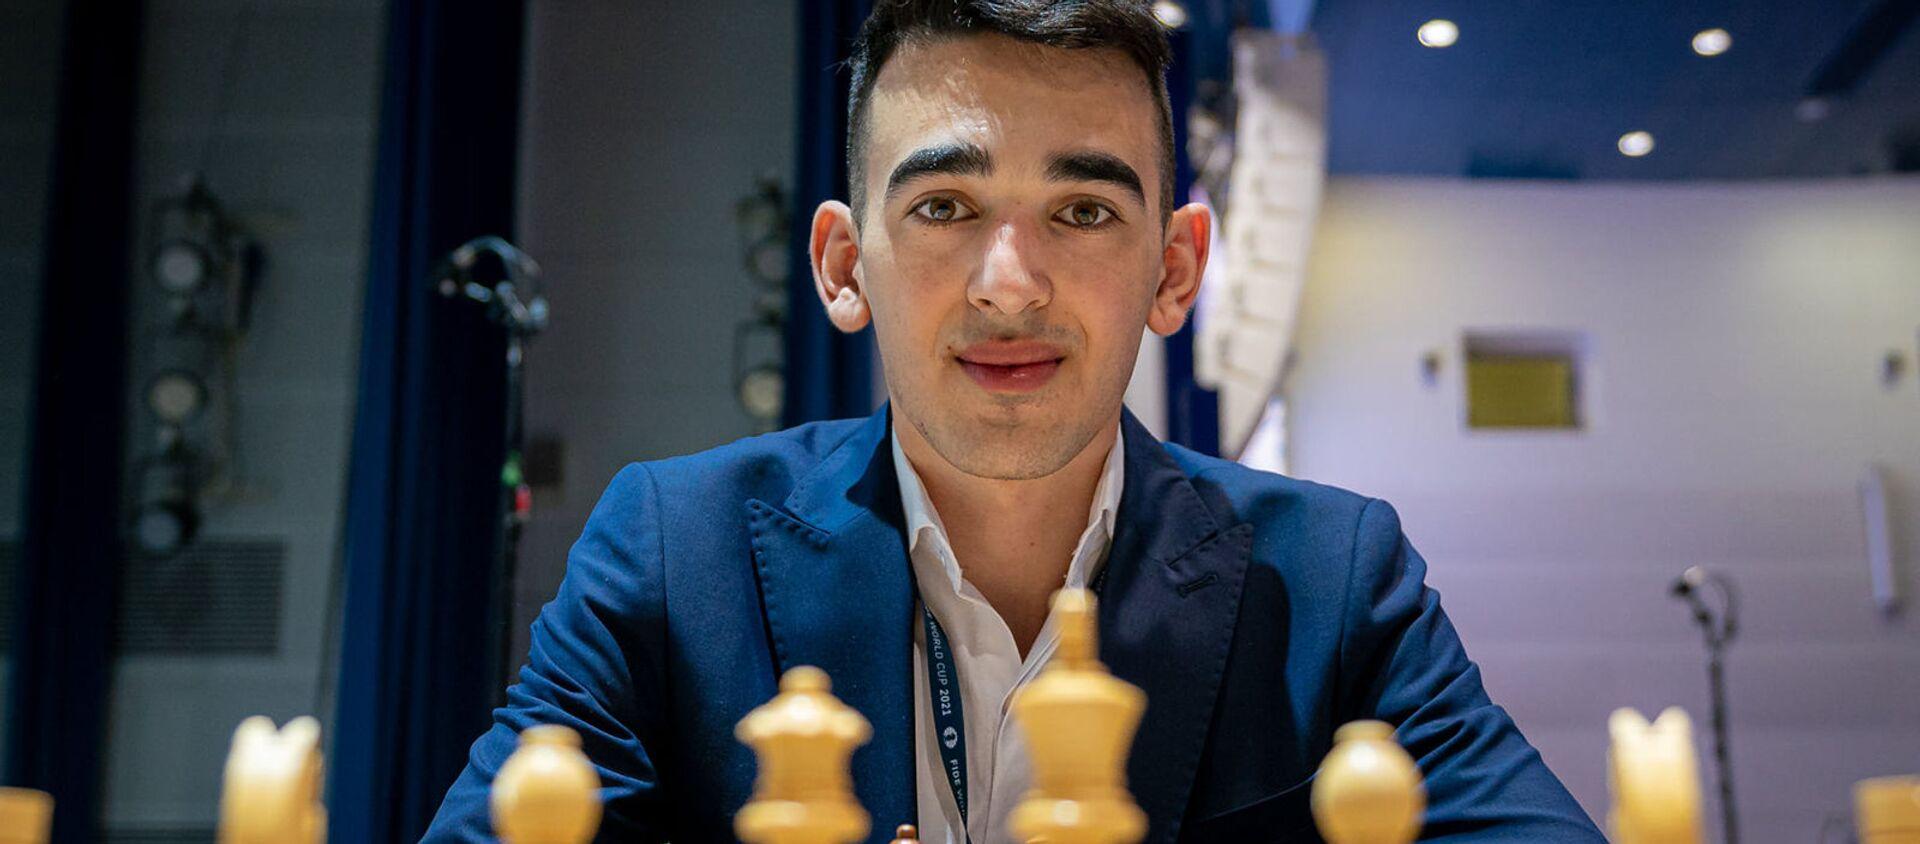 Айк Мартиросян на Чемпионате мира по шахматам в Сочи - Sputnik Արմենիա, 1920, 21.07.2021